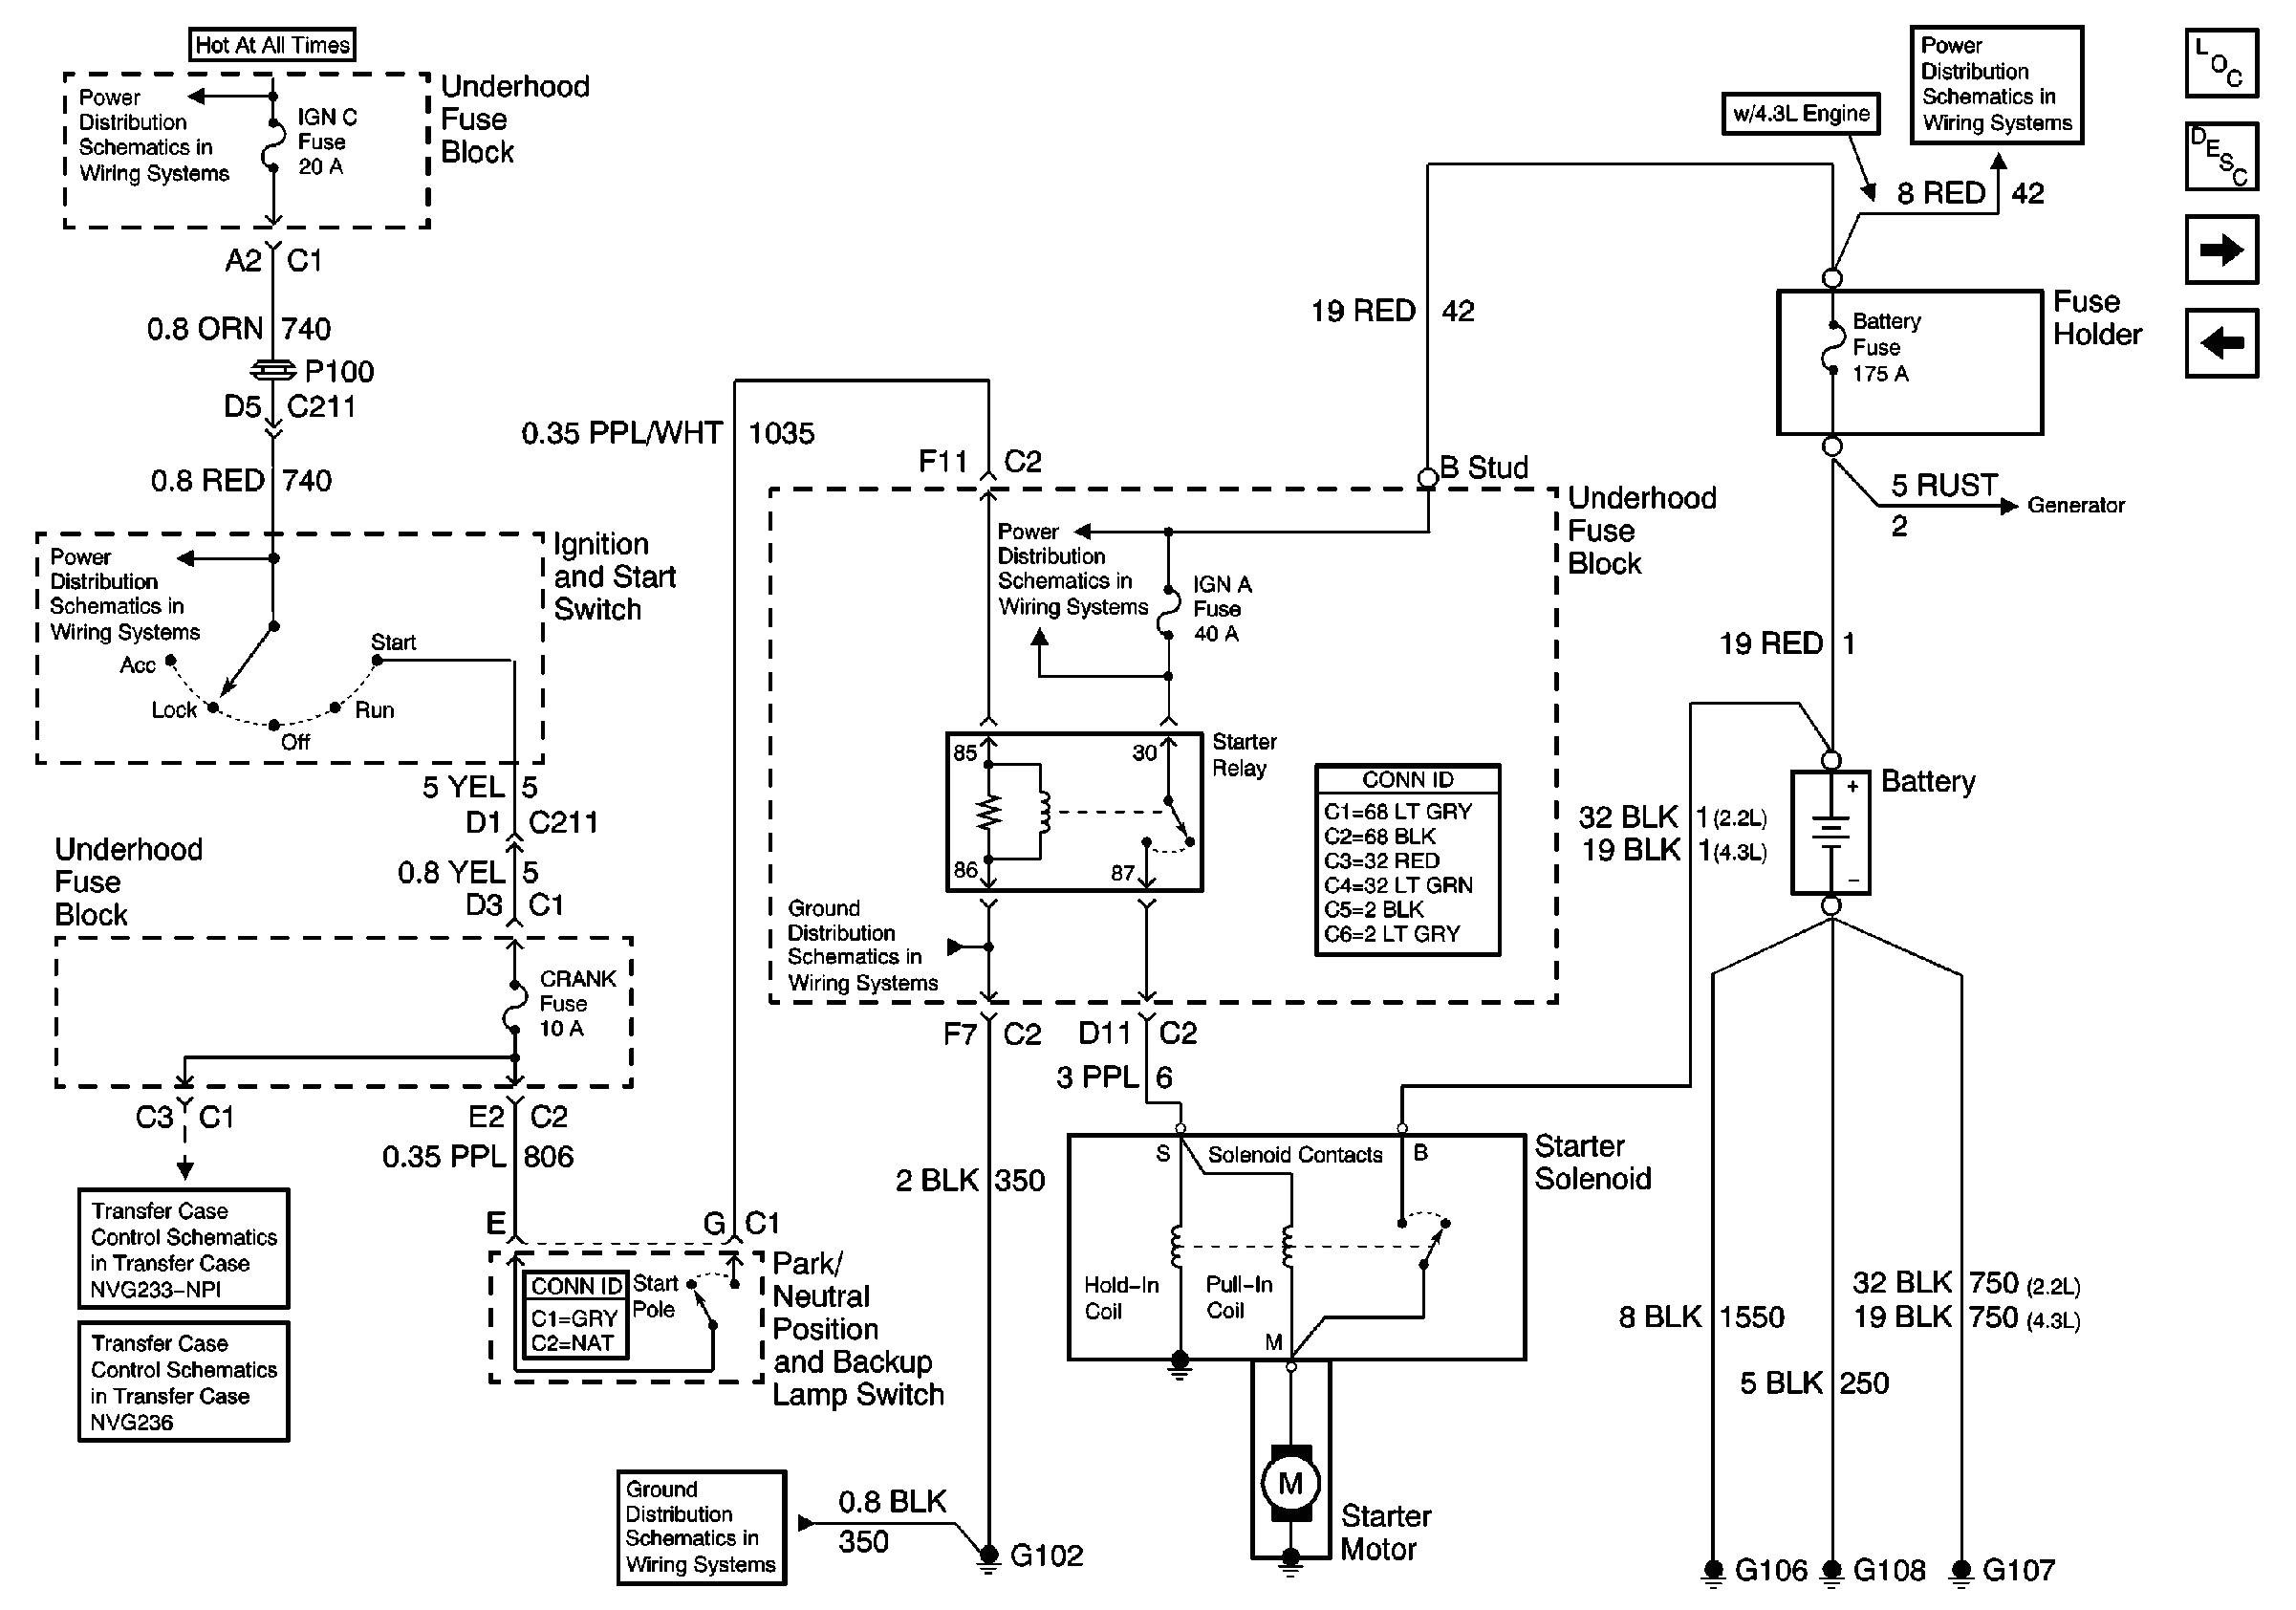 2004 Chevy Trailblazer Ignition Wiring Diagram Trailblazer Ignition Diagram Wiring Diagram Technic